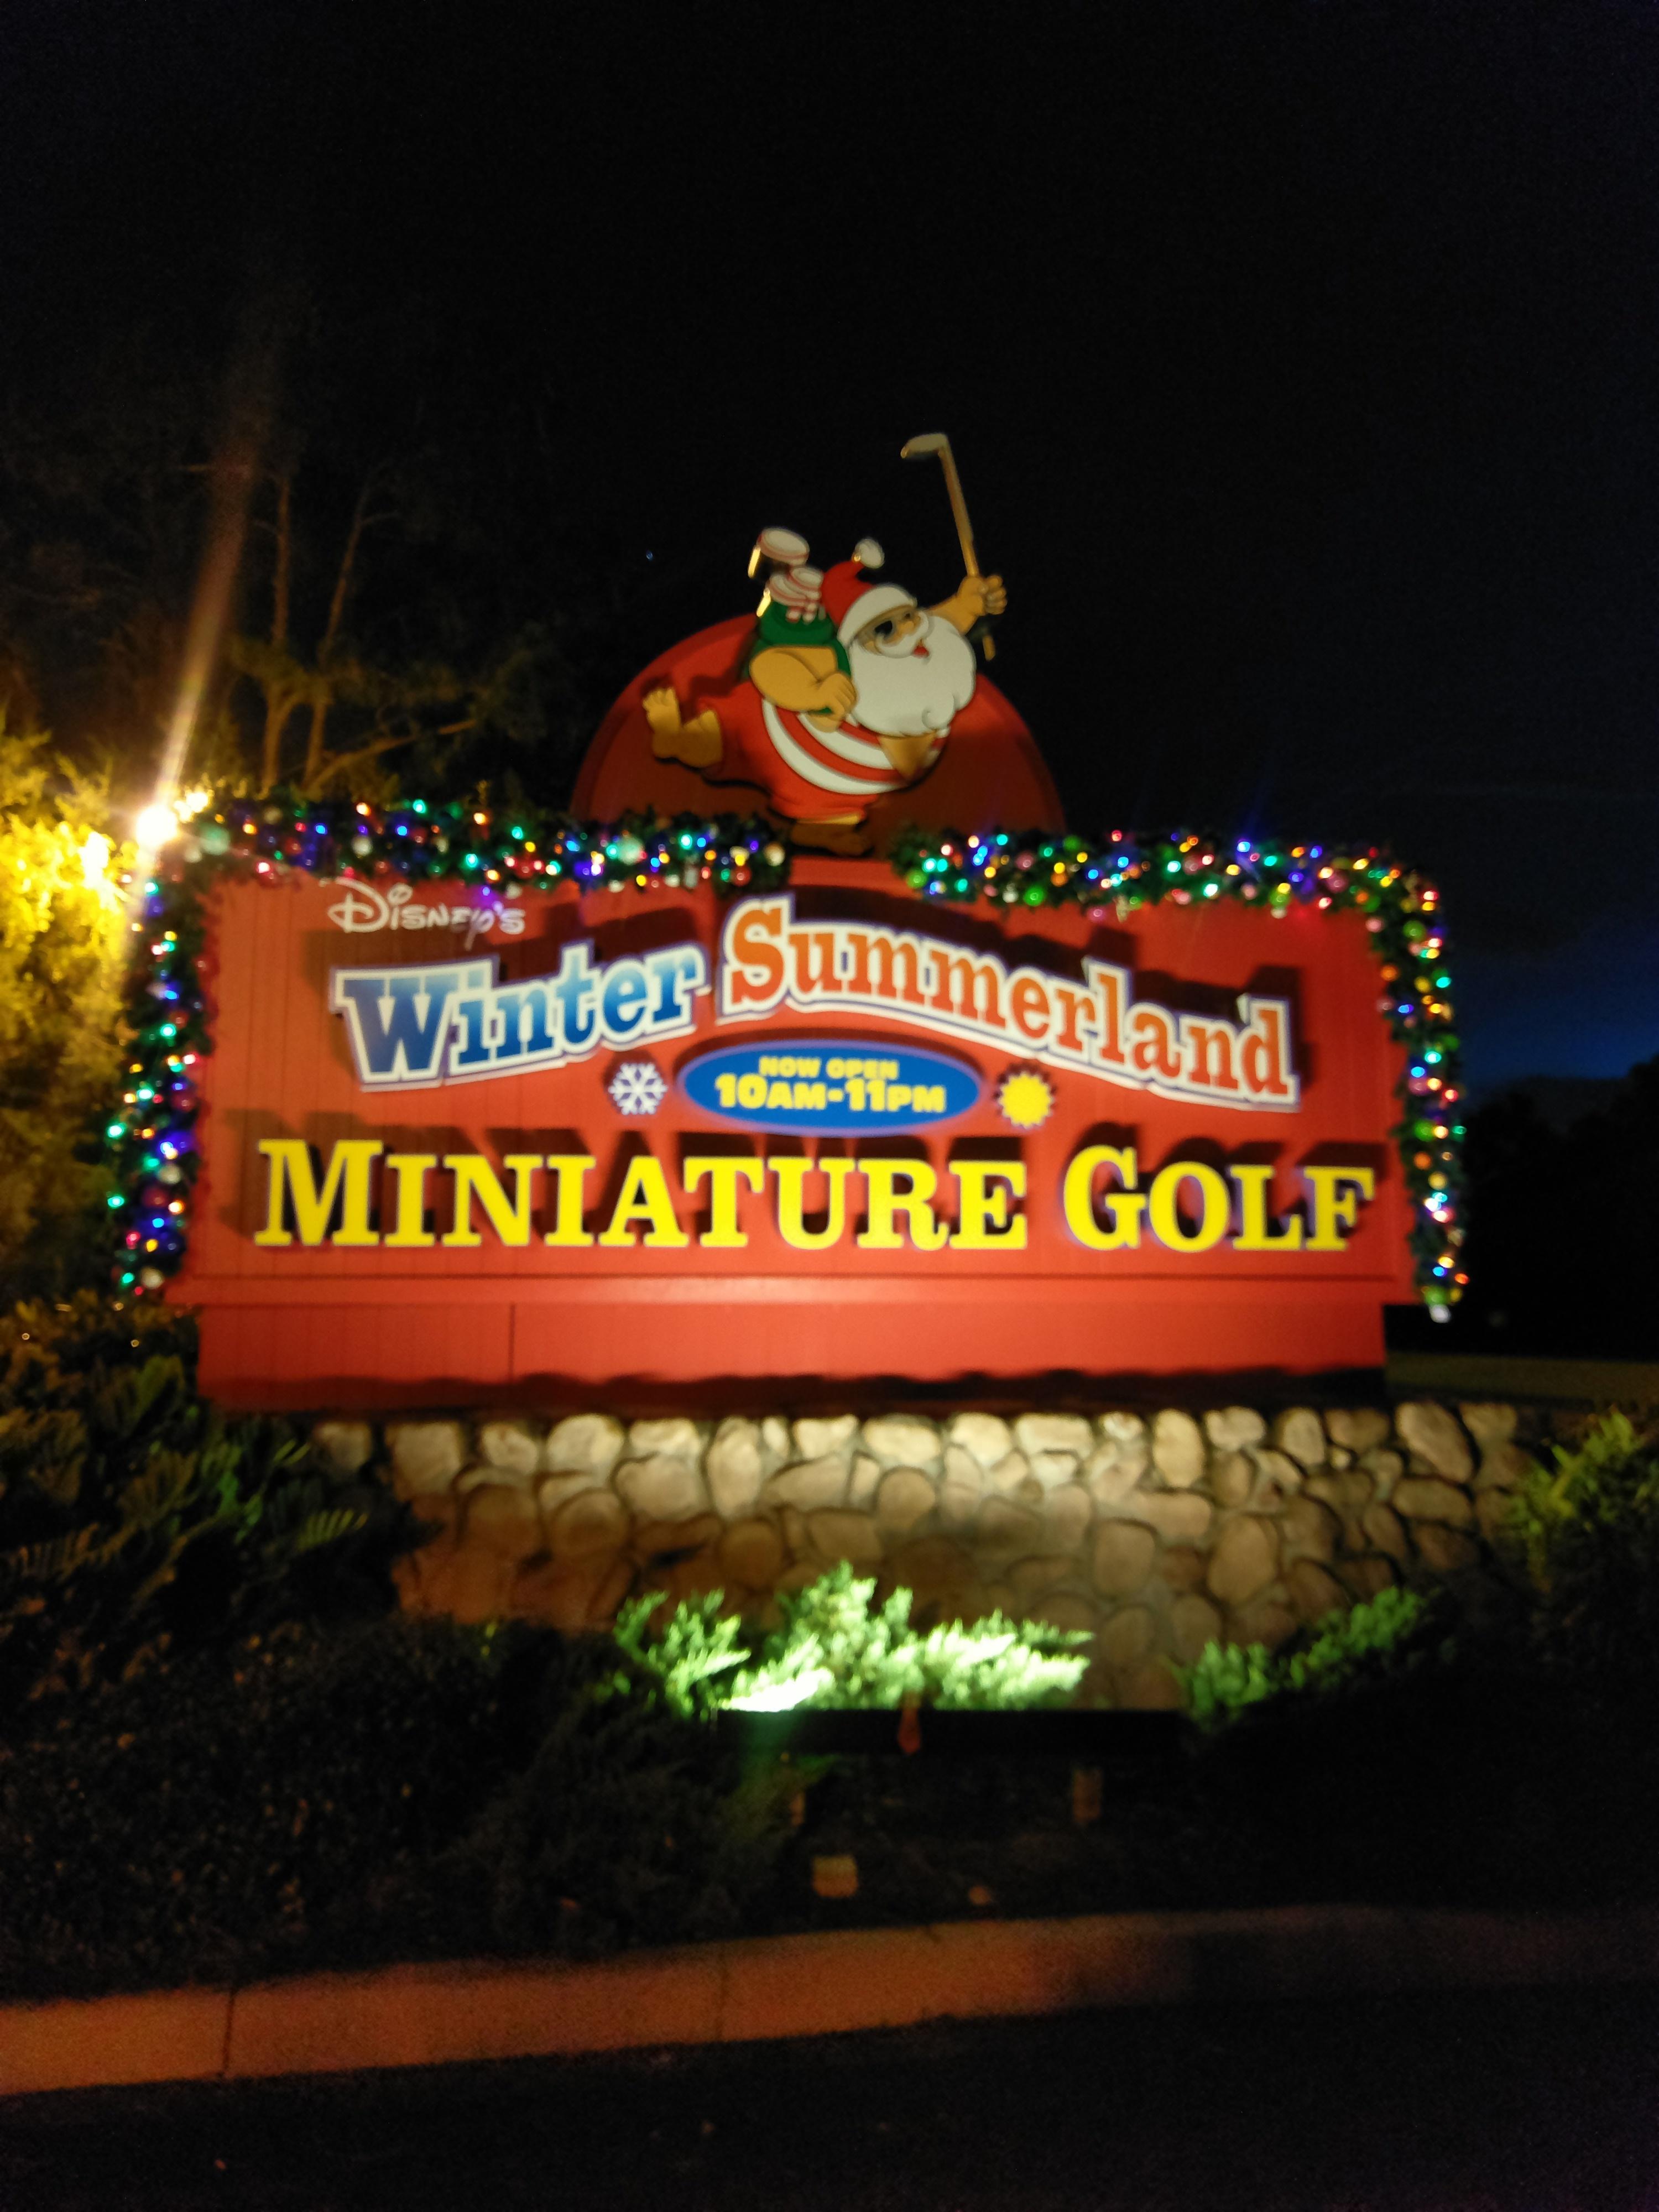 Disney's Winter Summerland miniature golf, Orlando